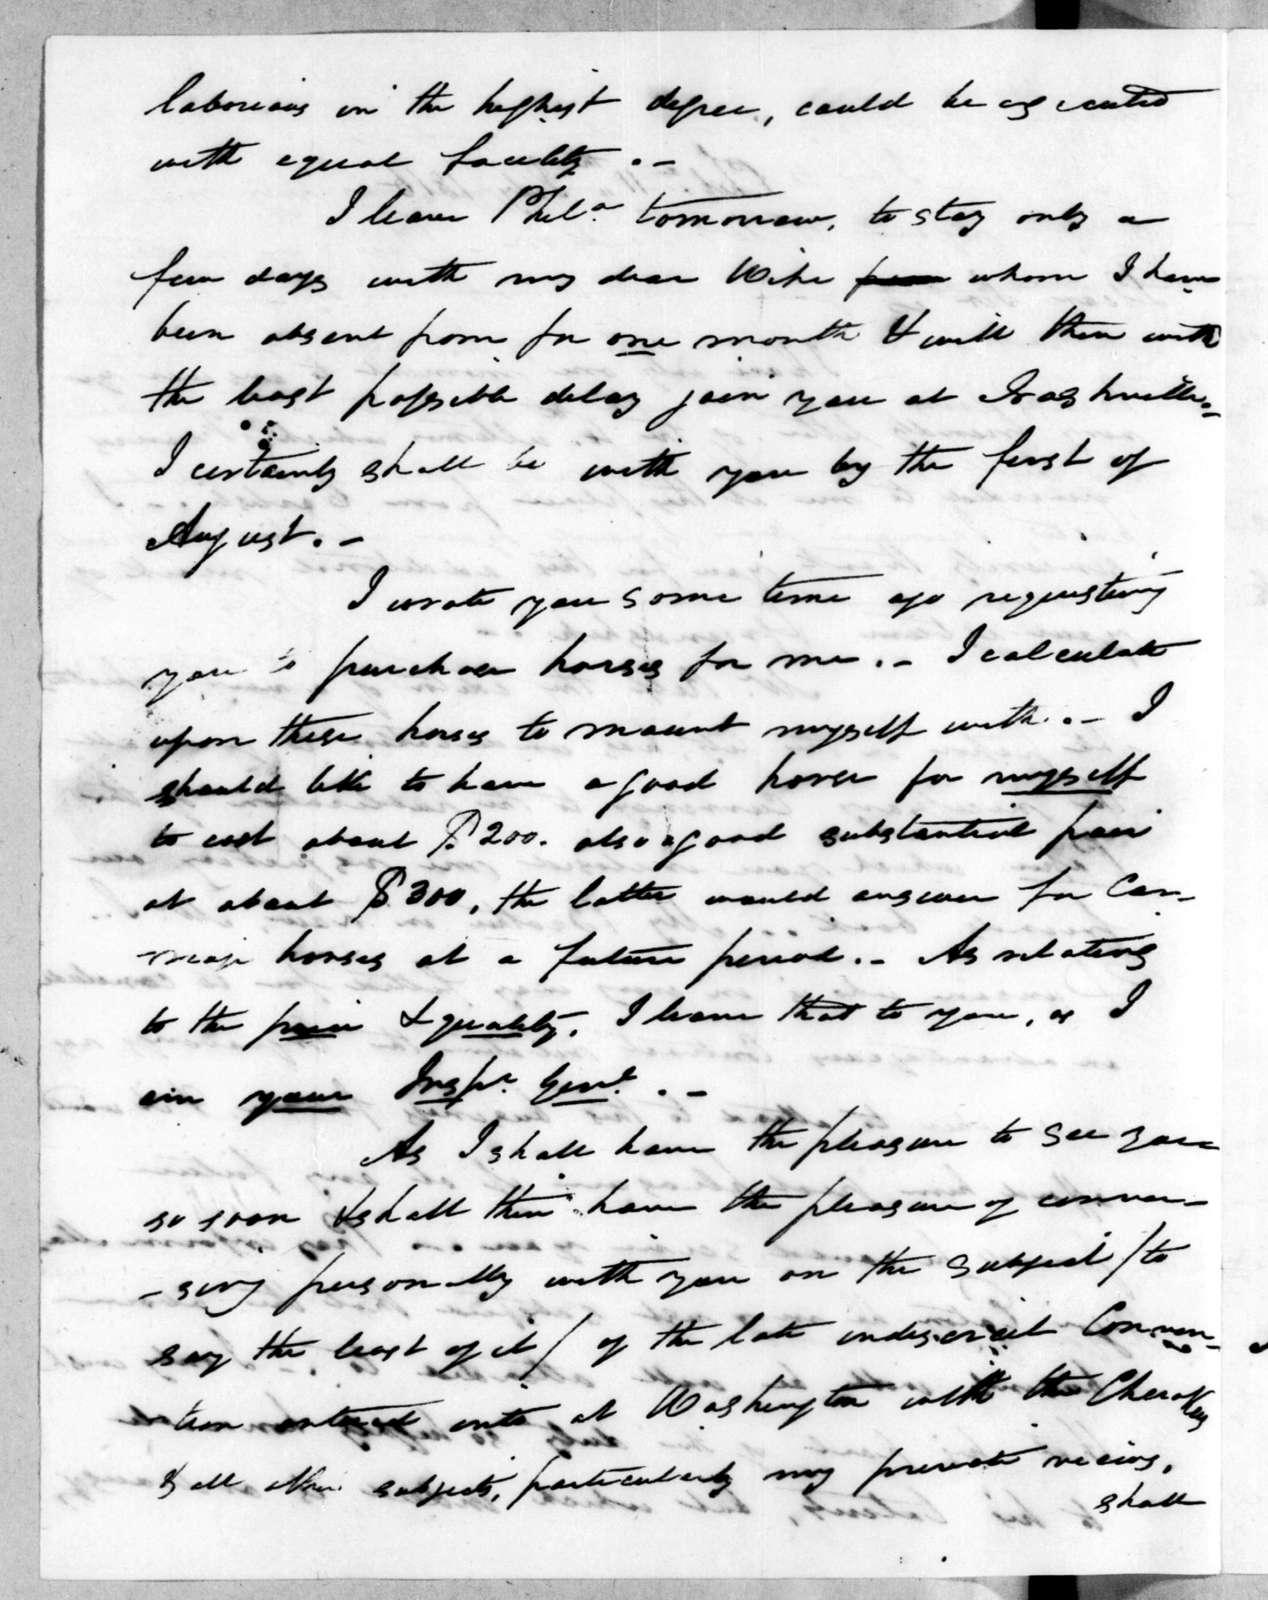 Arthur Peronneau Hayne to Andrew Jackson, July 11, 1816